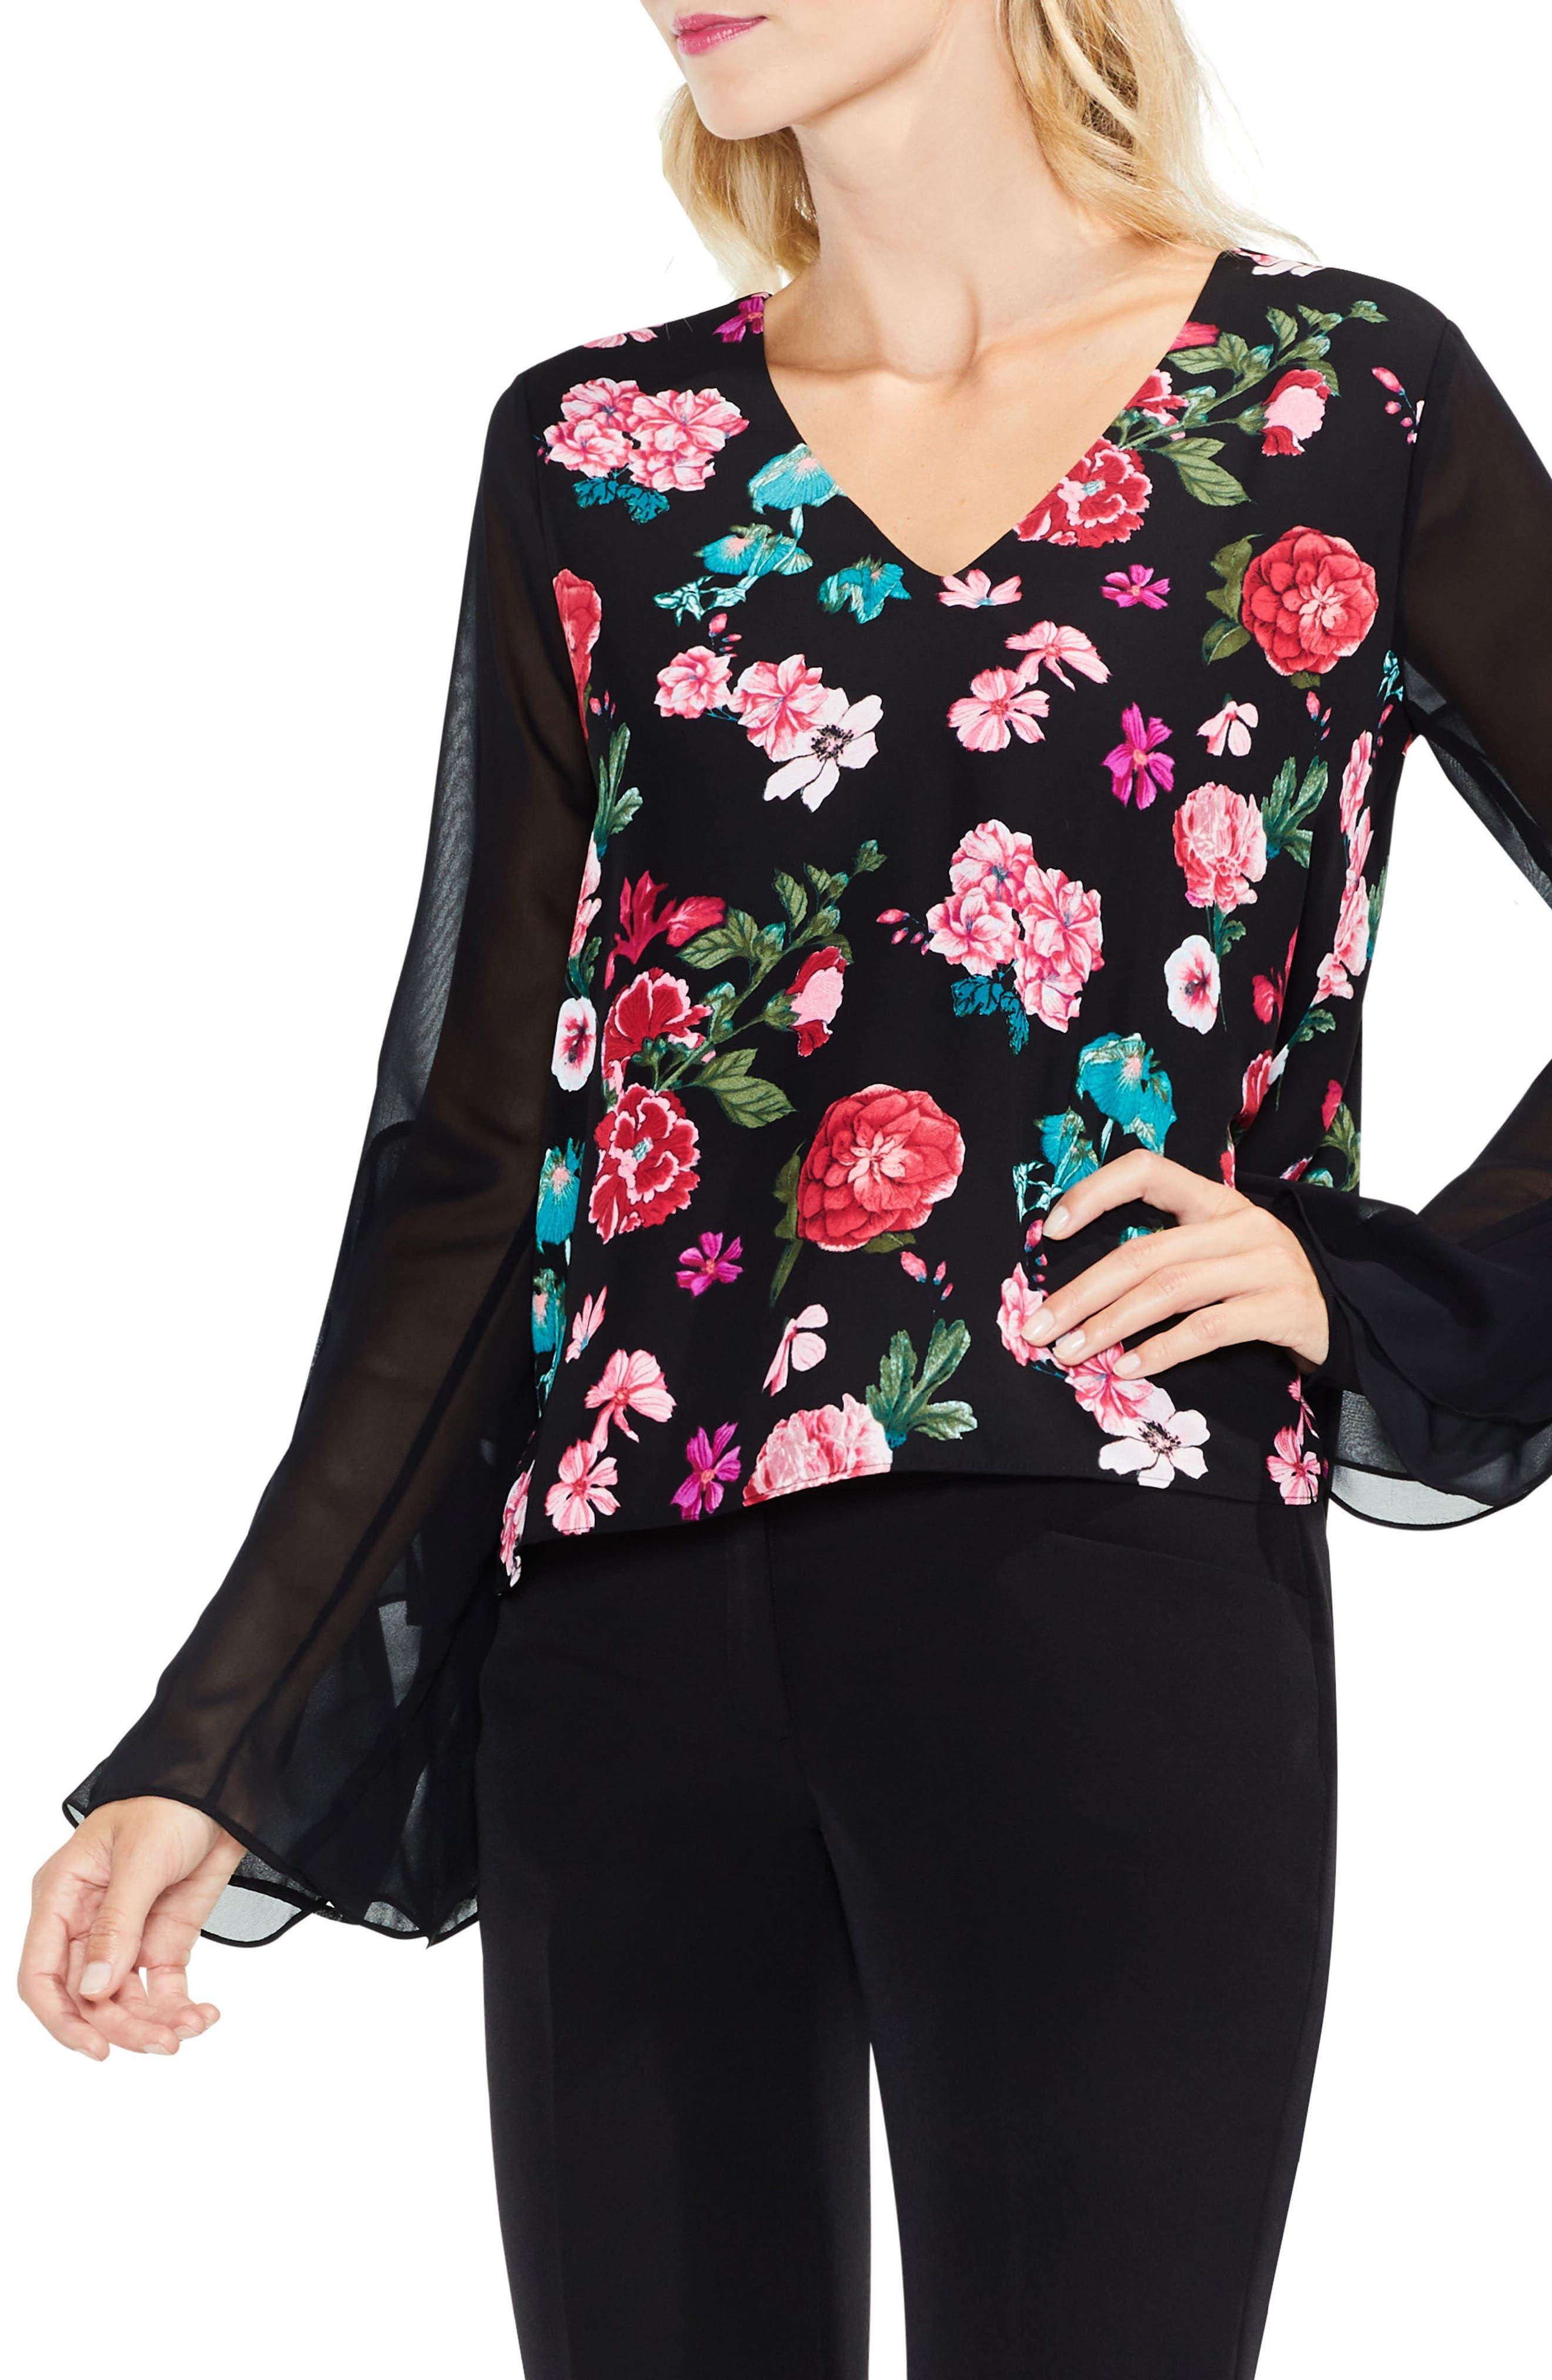 Alternate Image 1 Selected - Vince Camuto Floral Heirloom Ruffle Sleeve Top